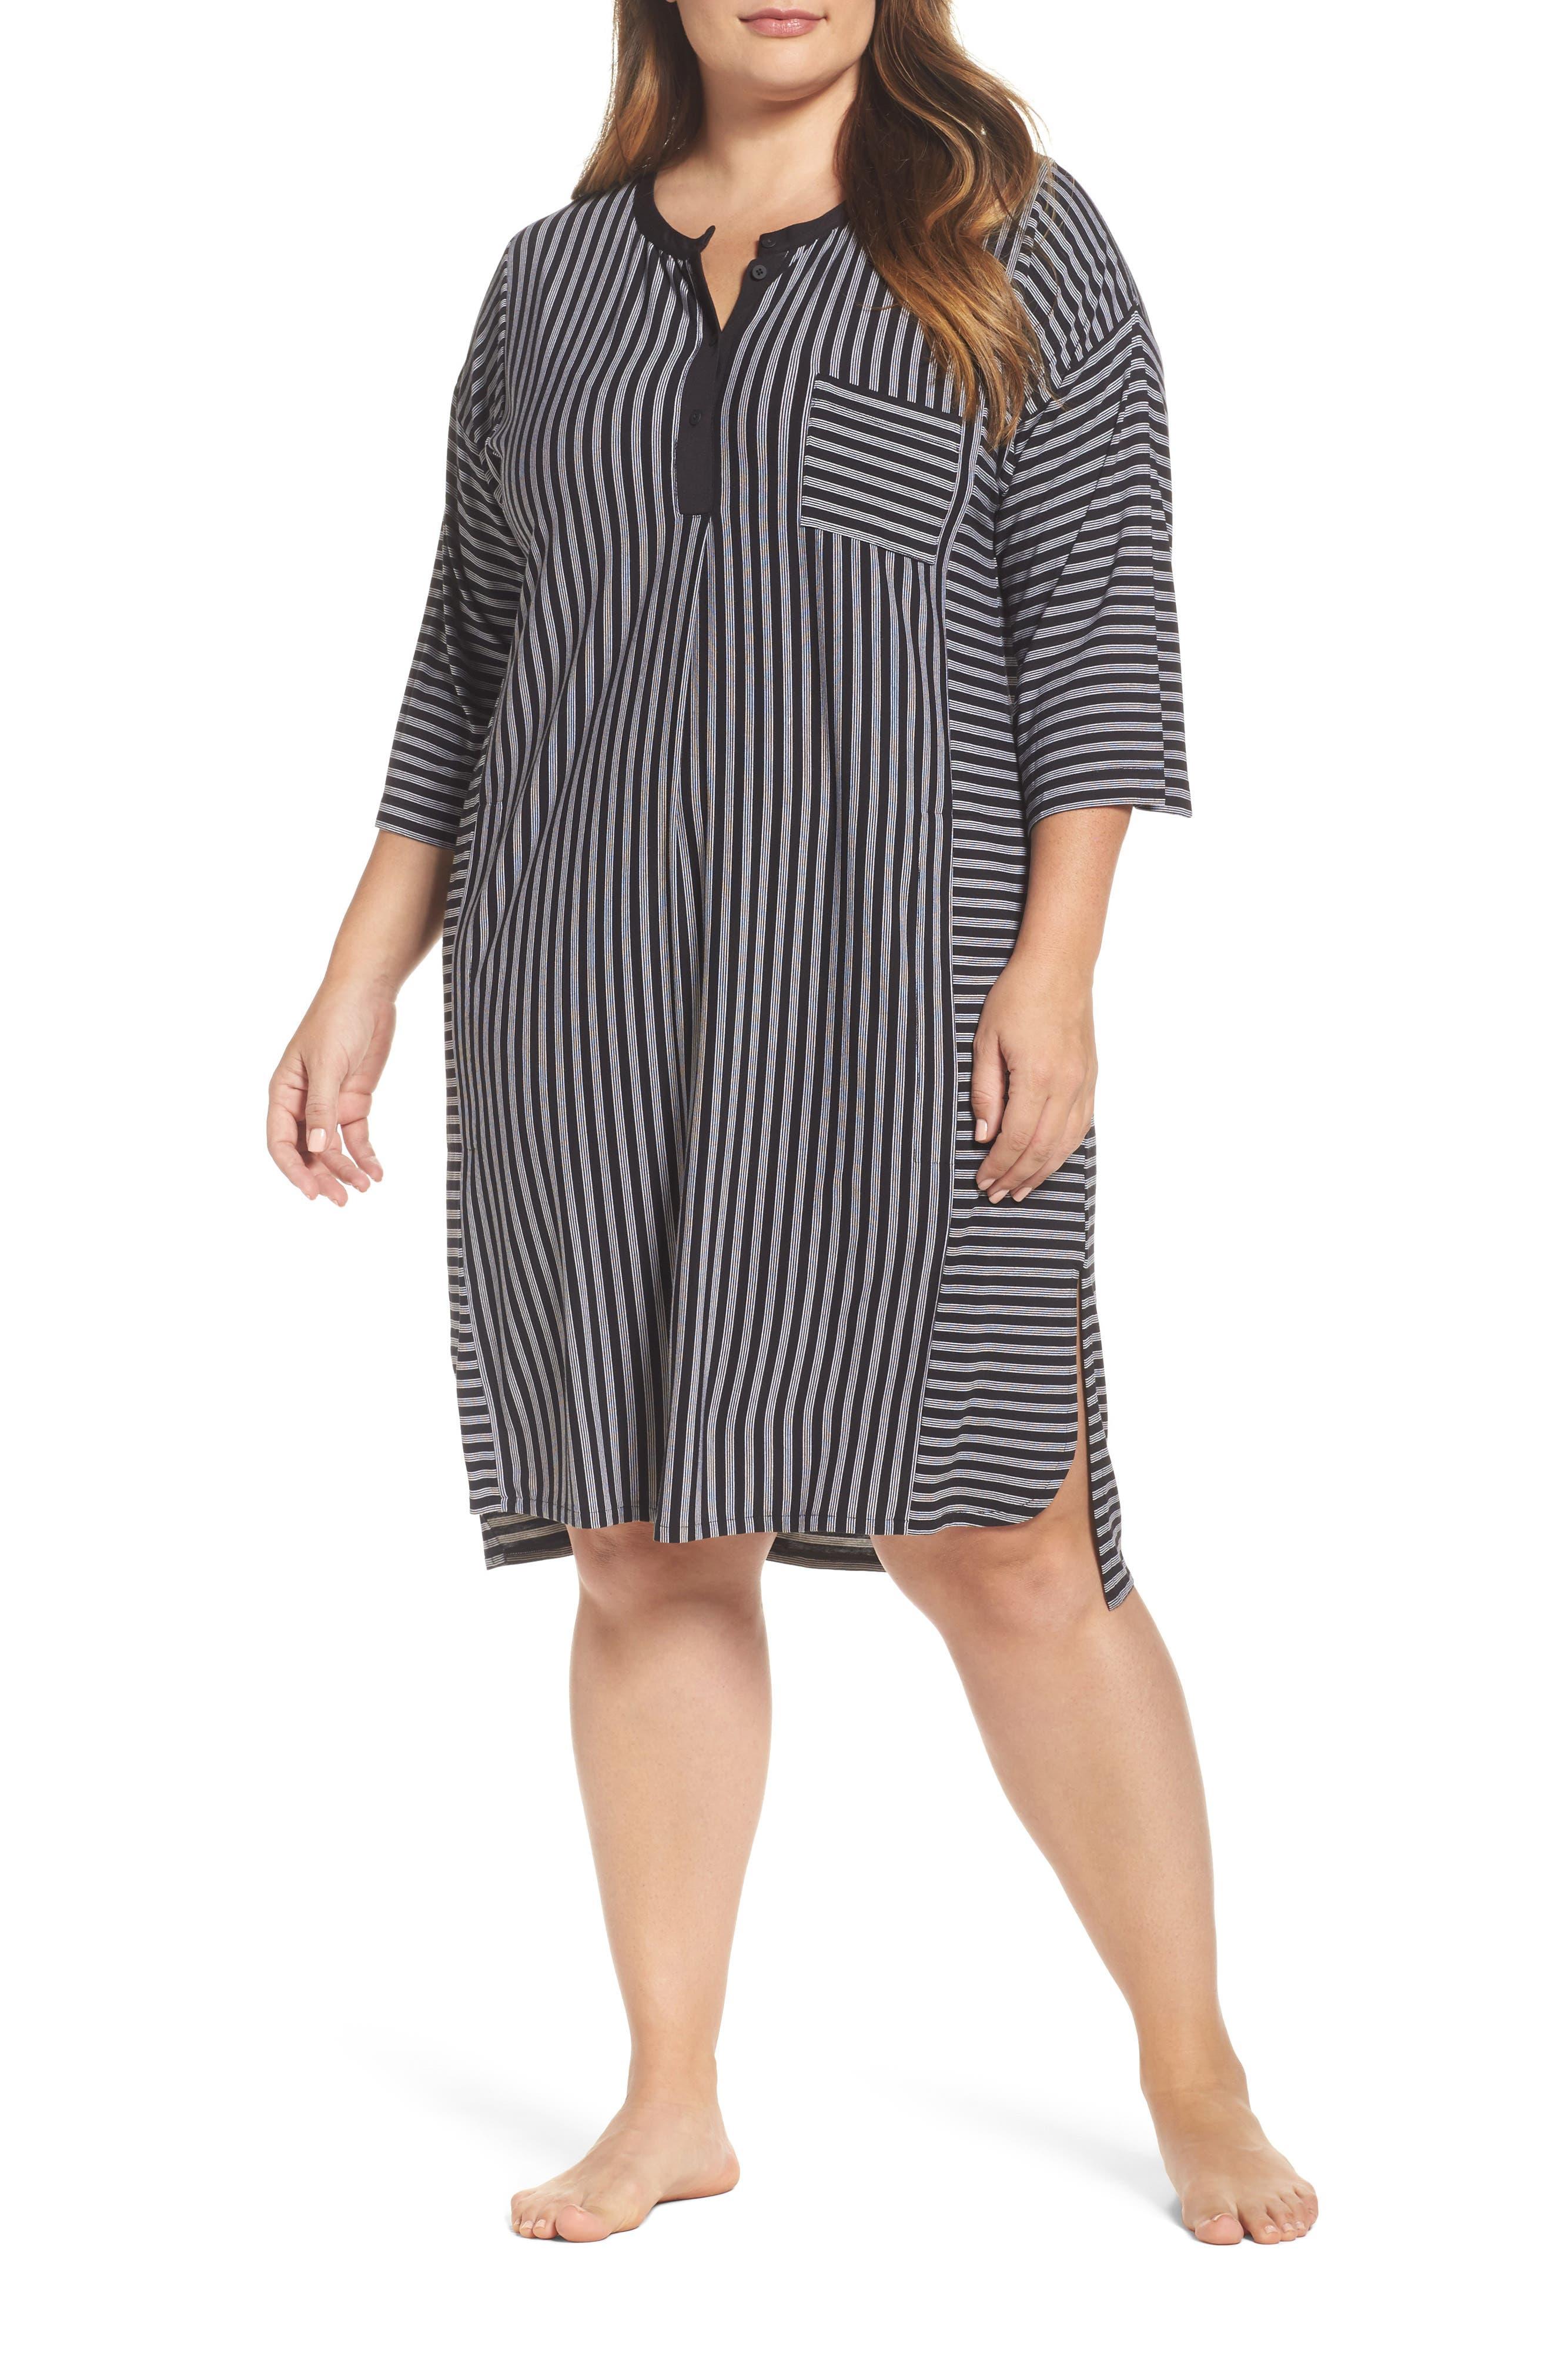 DKNY Stripe Sleepshirt (Plus Size)